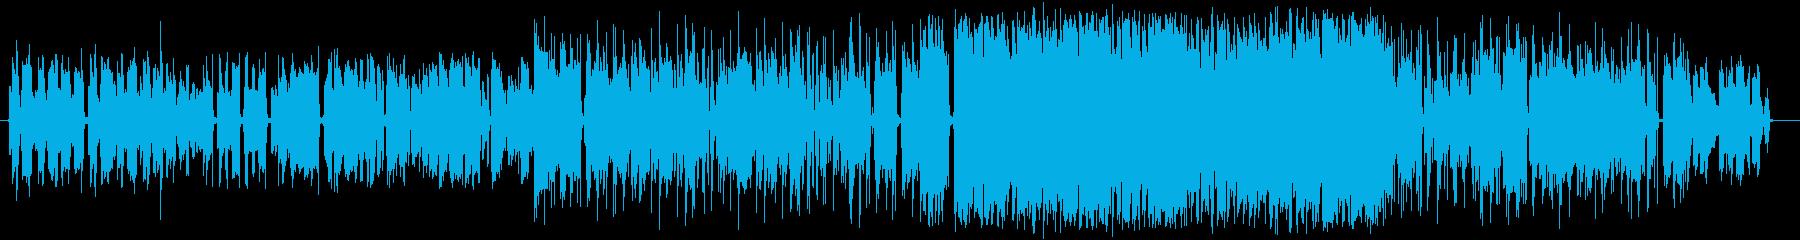 Acoustic & Rock ~ Yorushika Style ~'s reproduced waveform